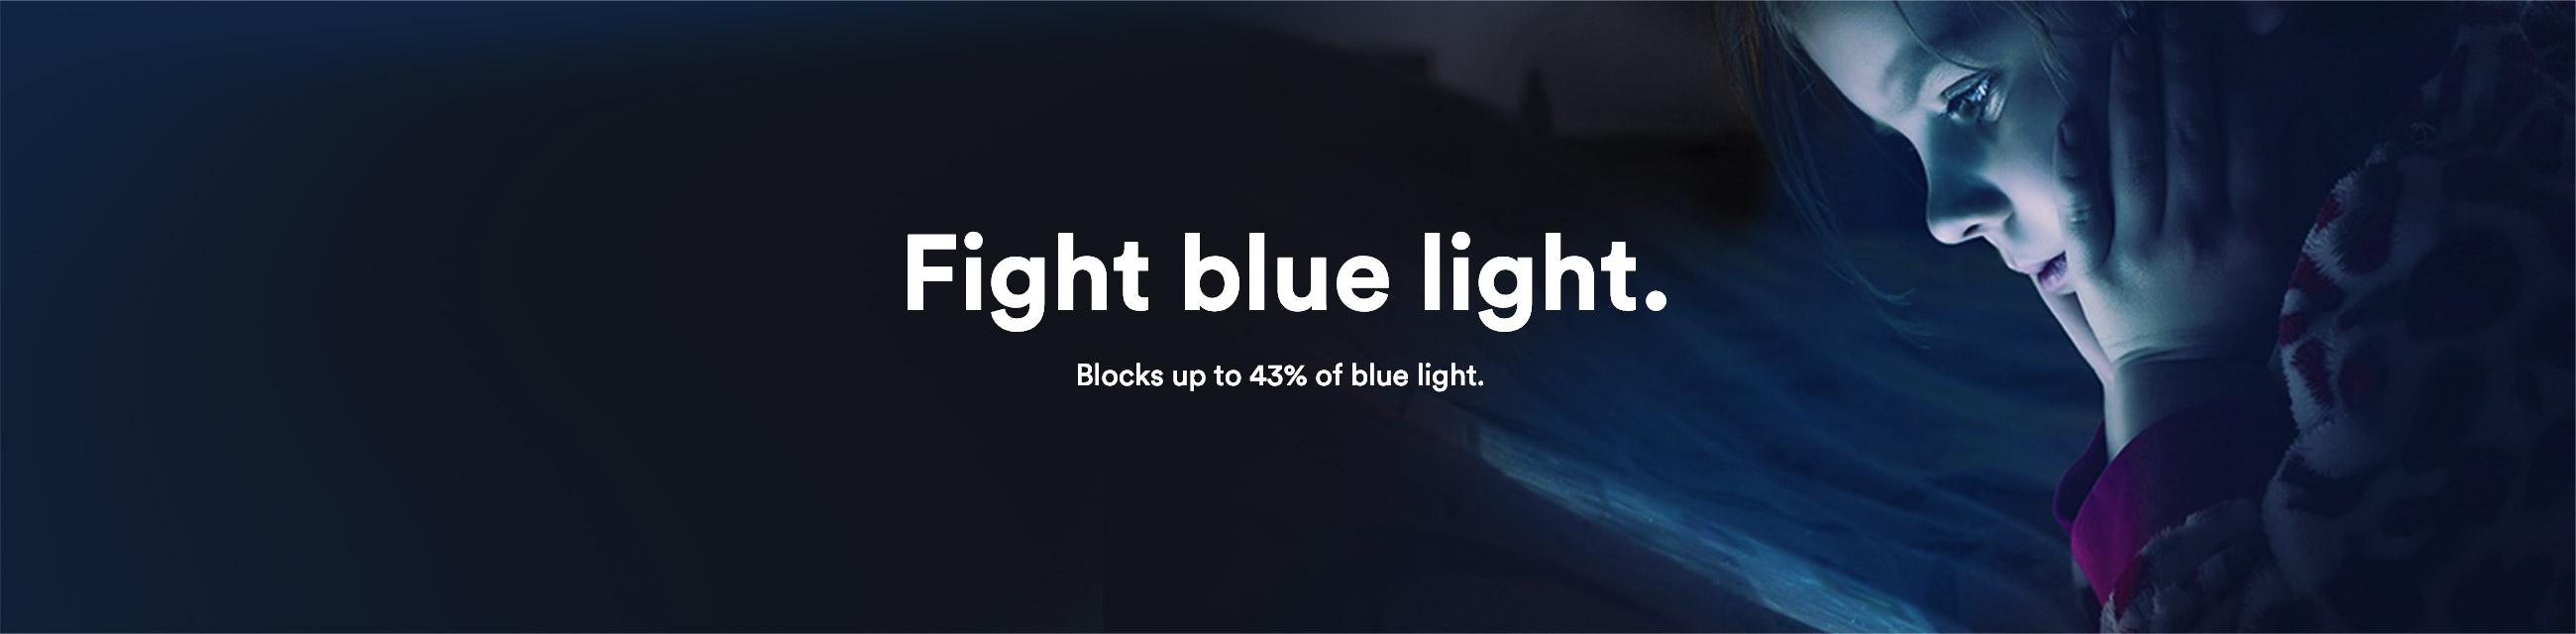 fight phone blue light